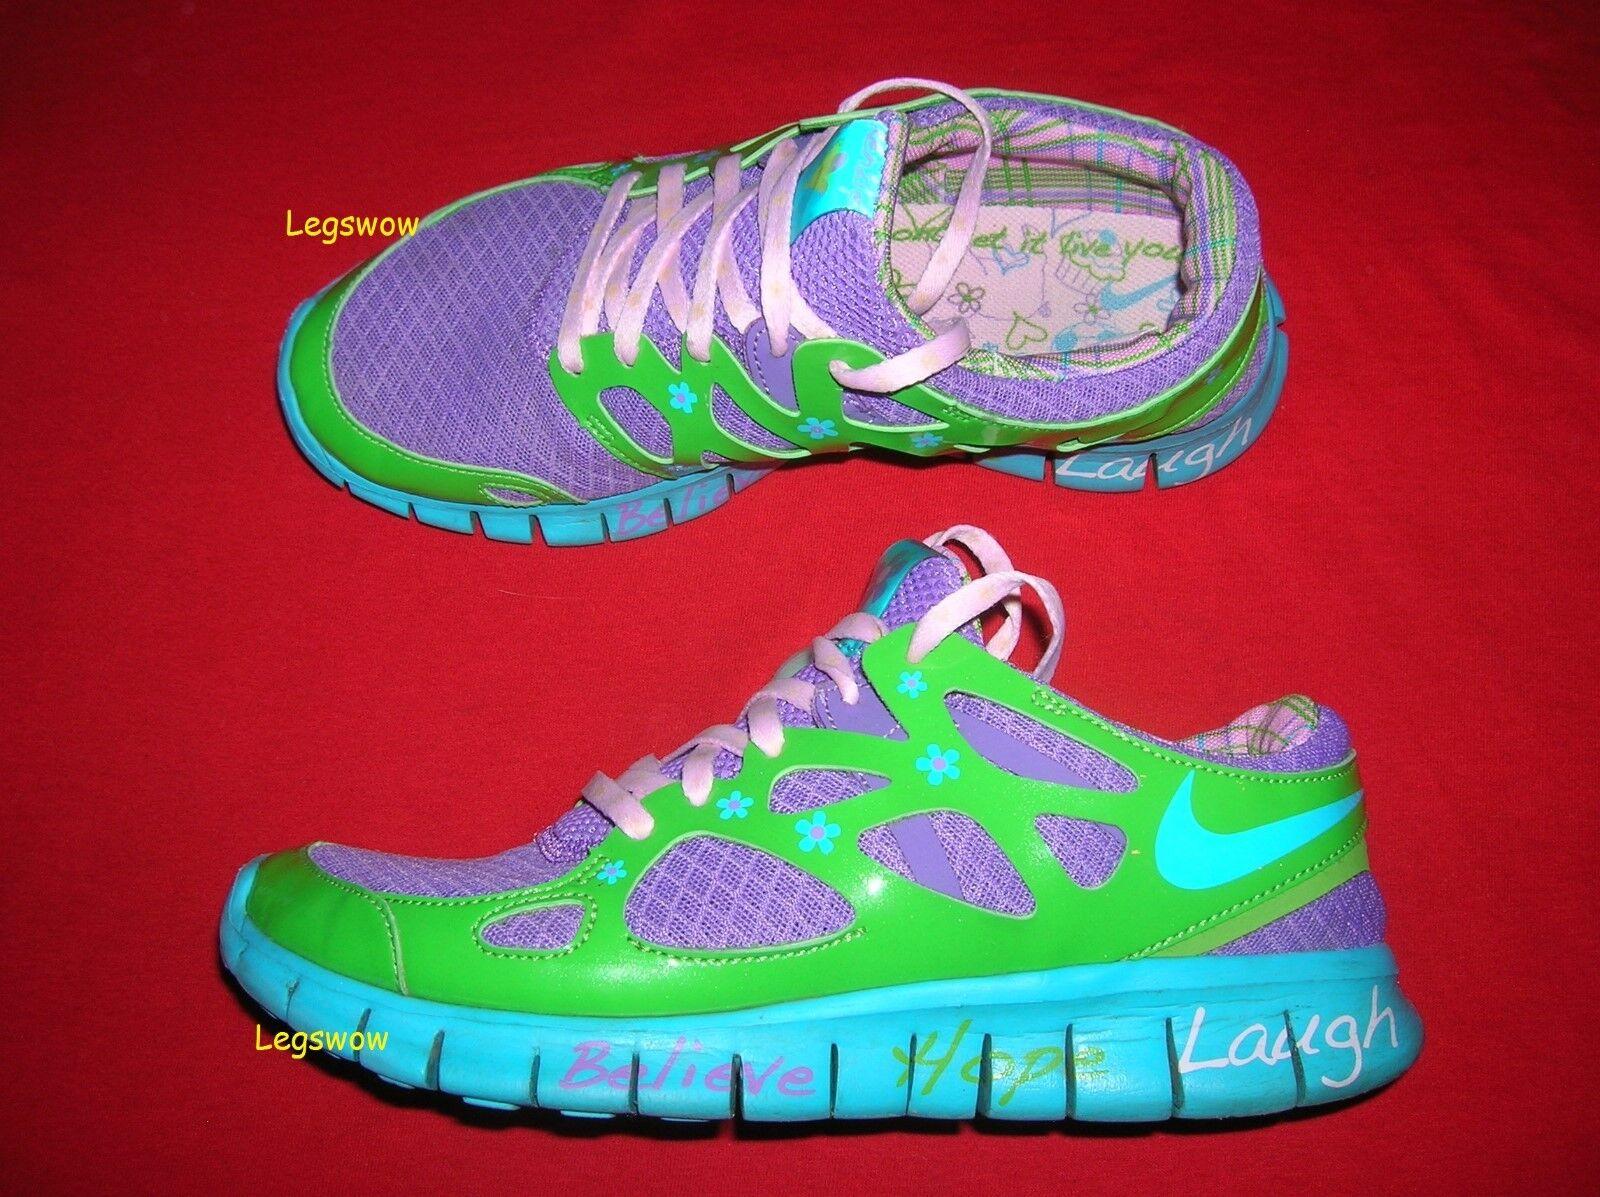 reputable site 2bc8d a4386 Nike libero 2 db bg giovani doernbecher scarpe viola 8 giovani bg donne  scarpe verdi 6,5 7d1f50